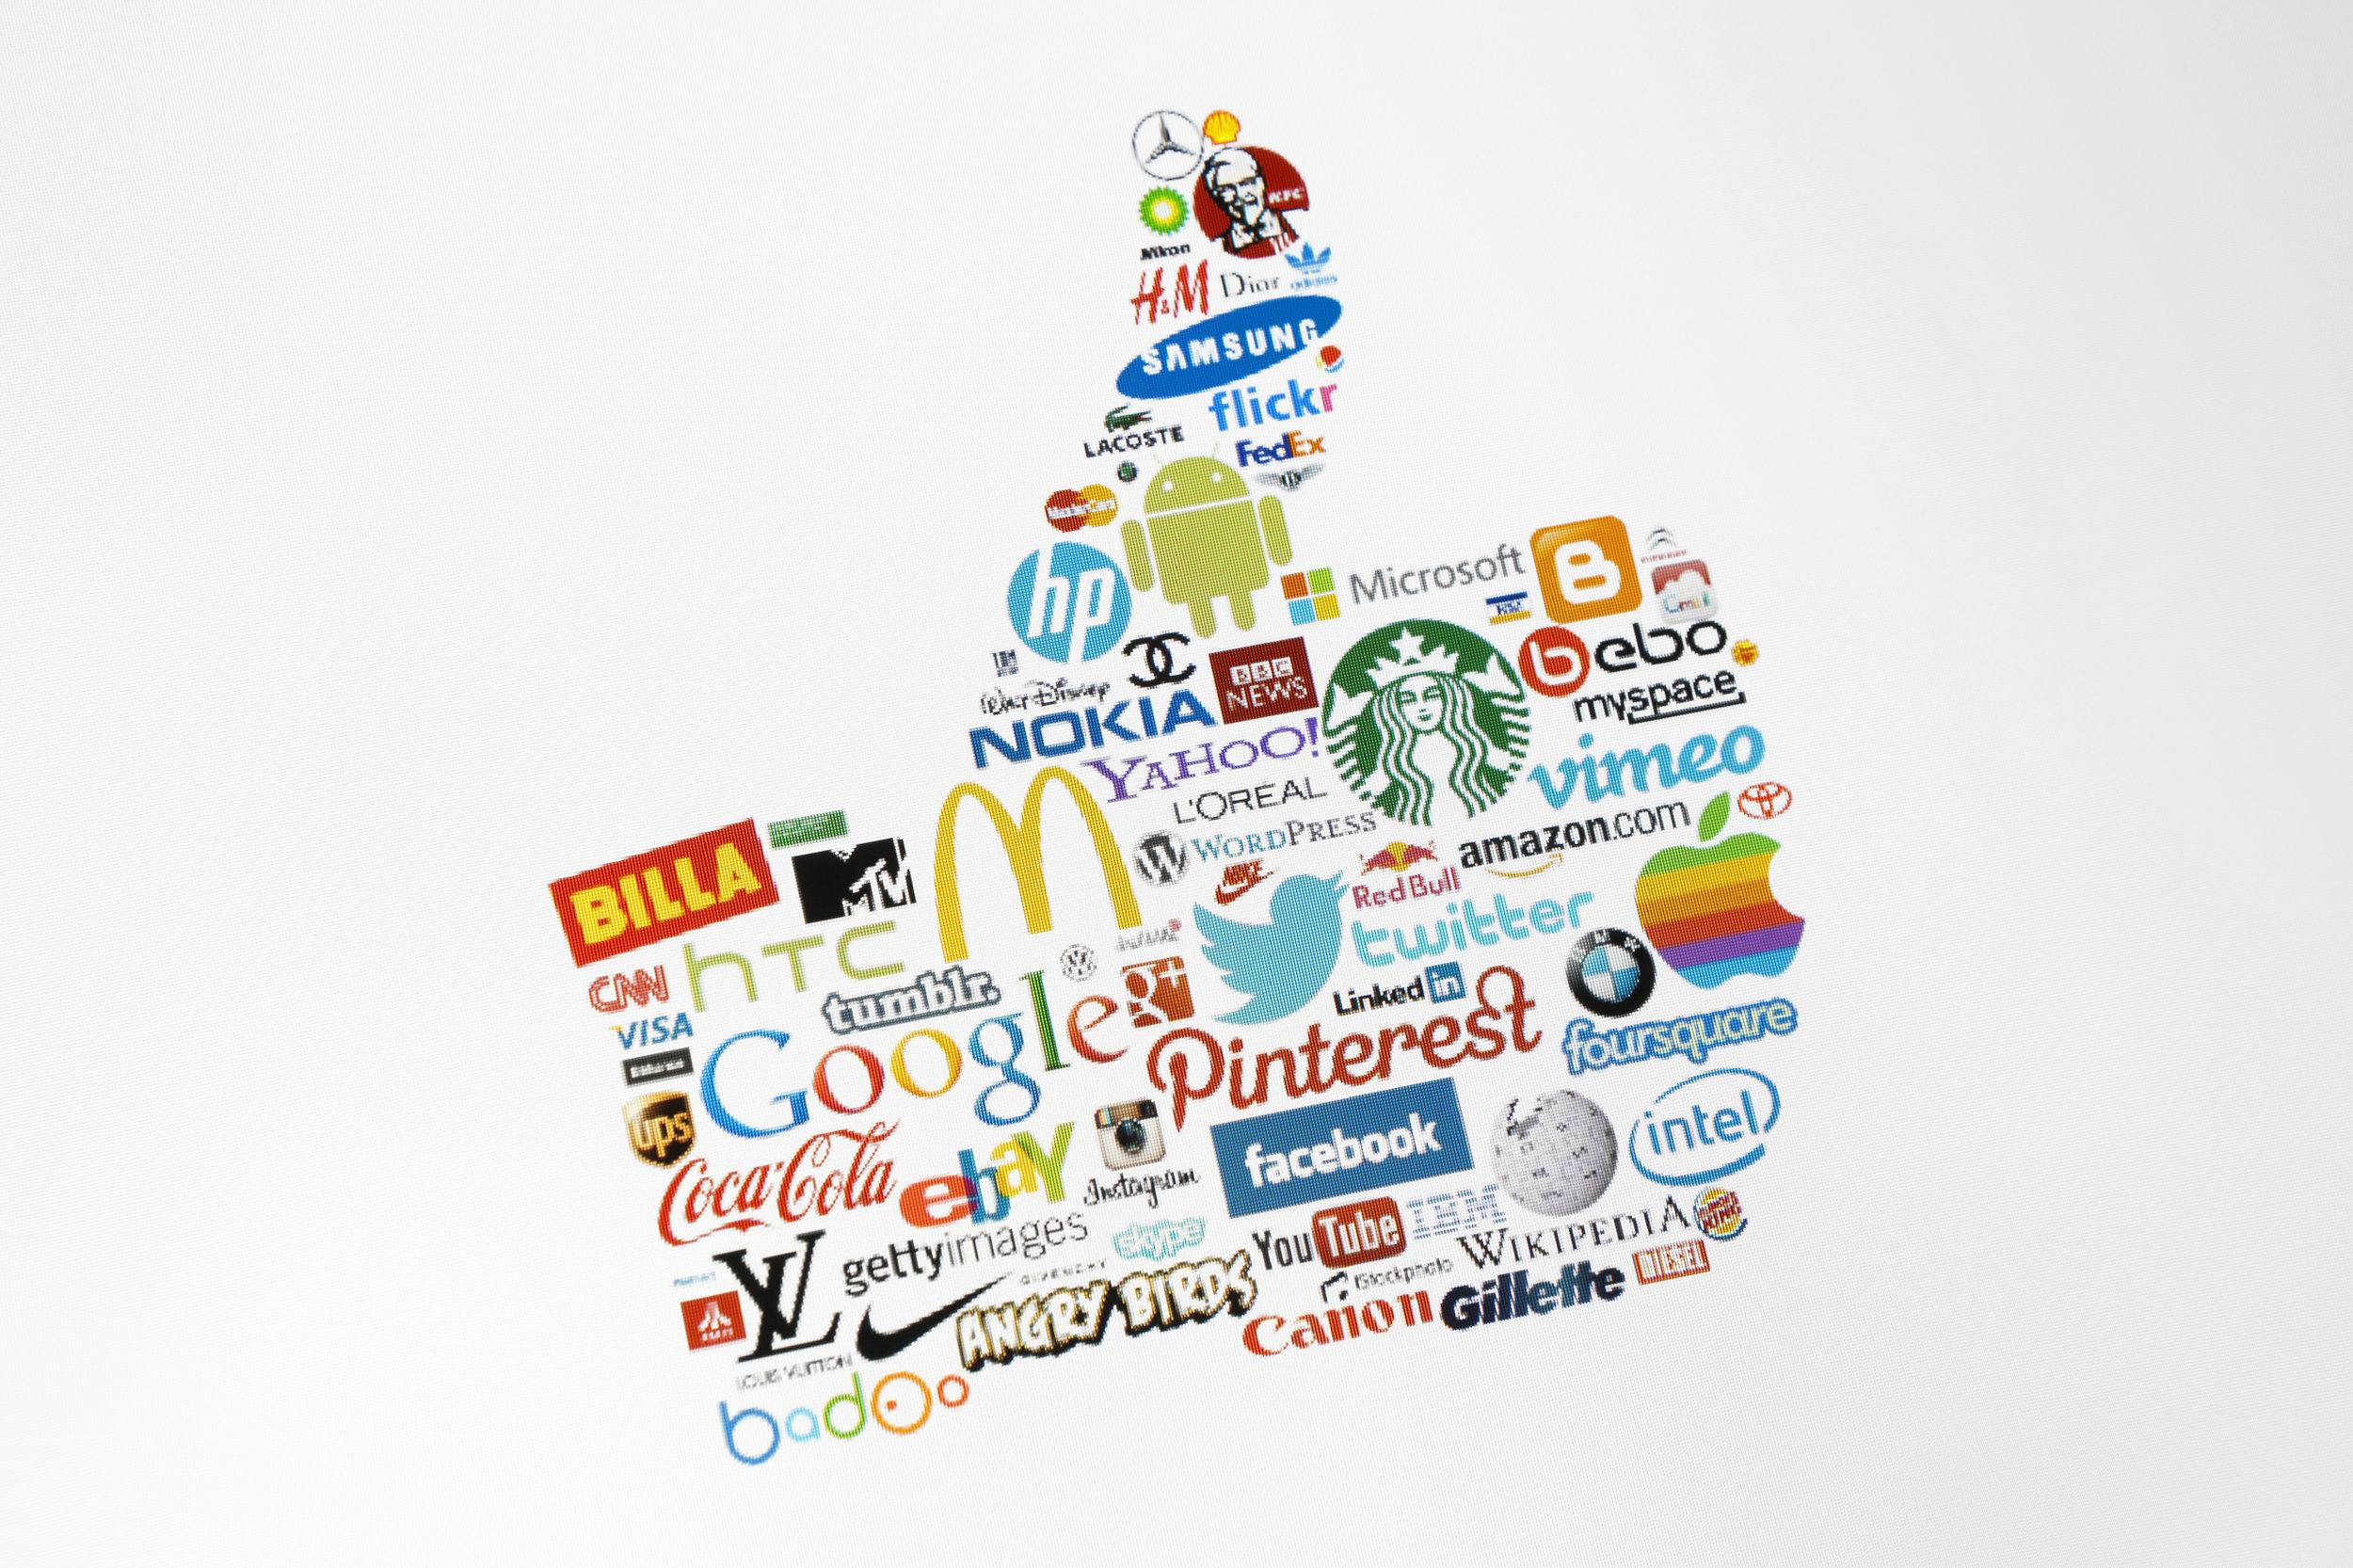 brand-logos-thumbs-up.jpg